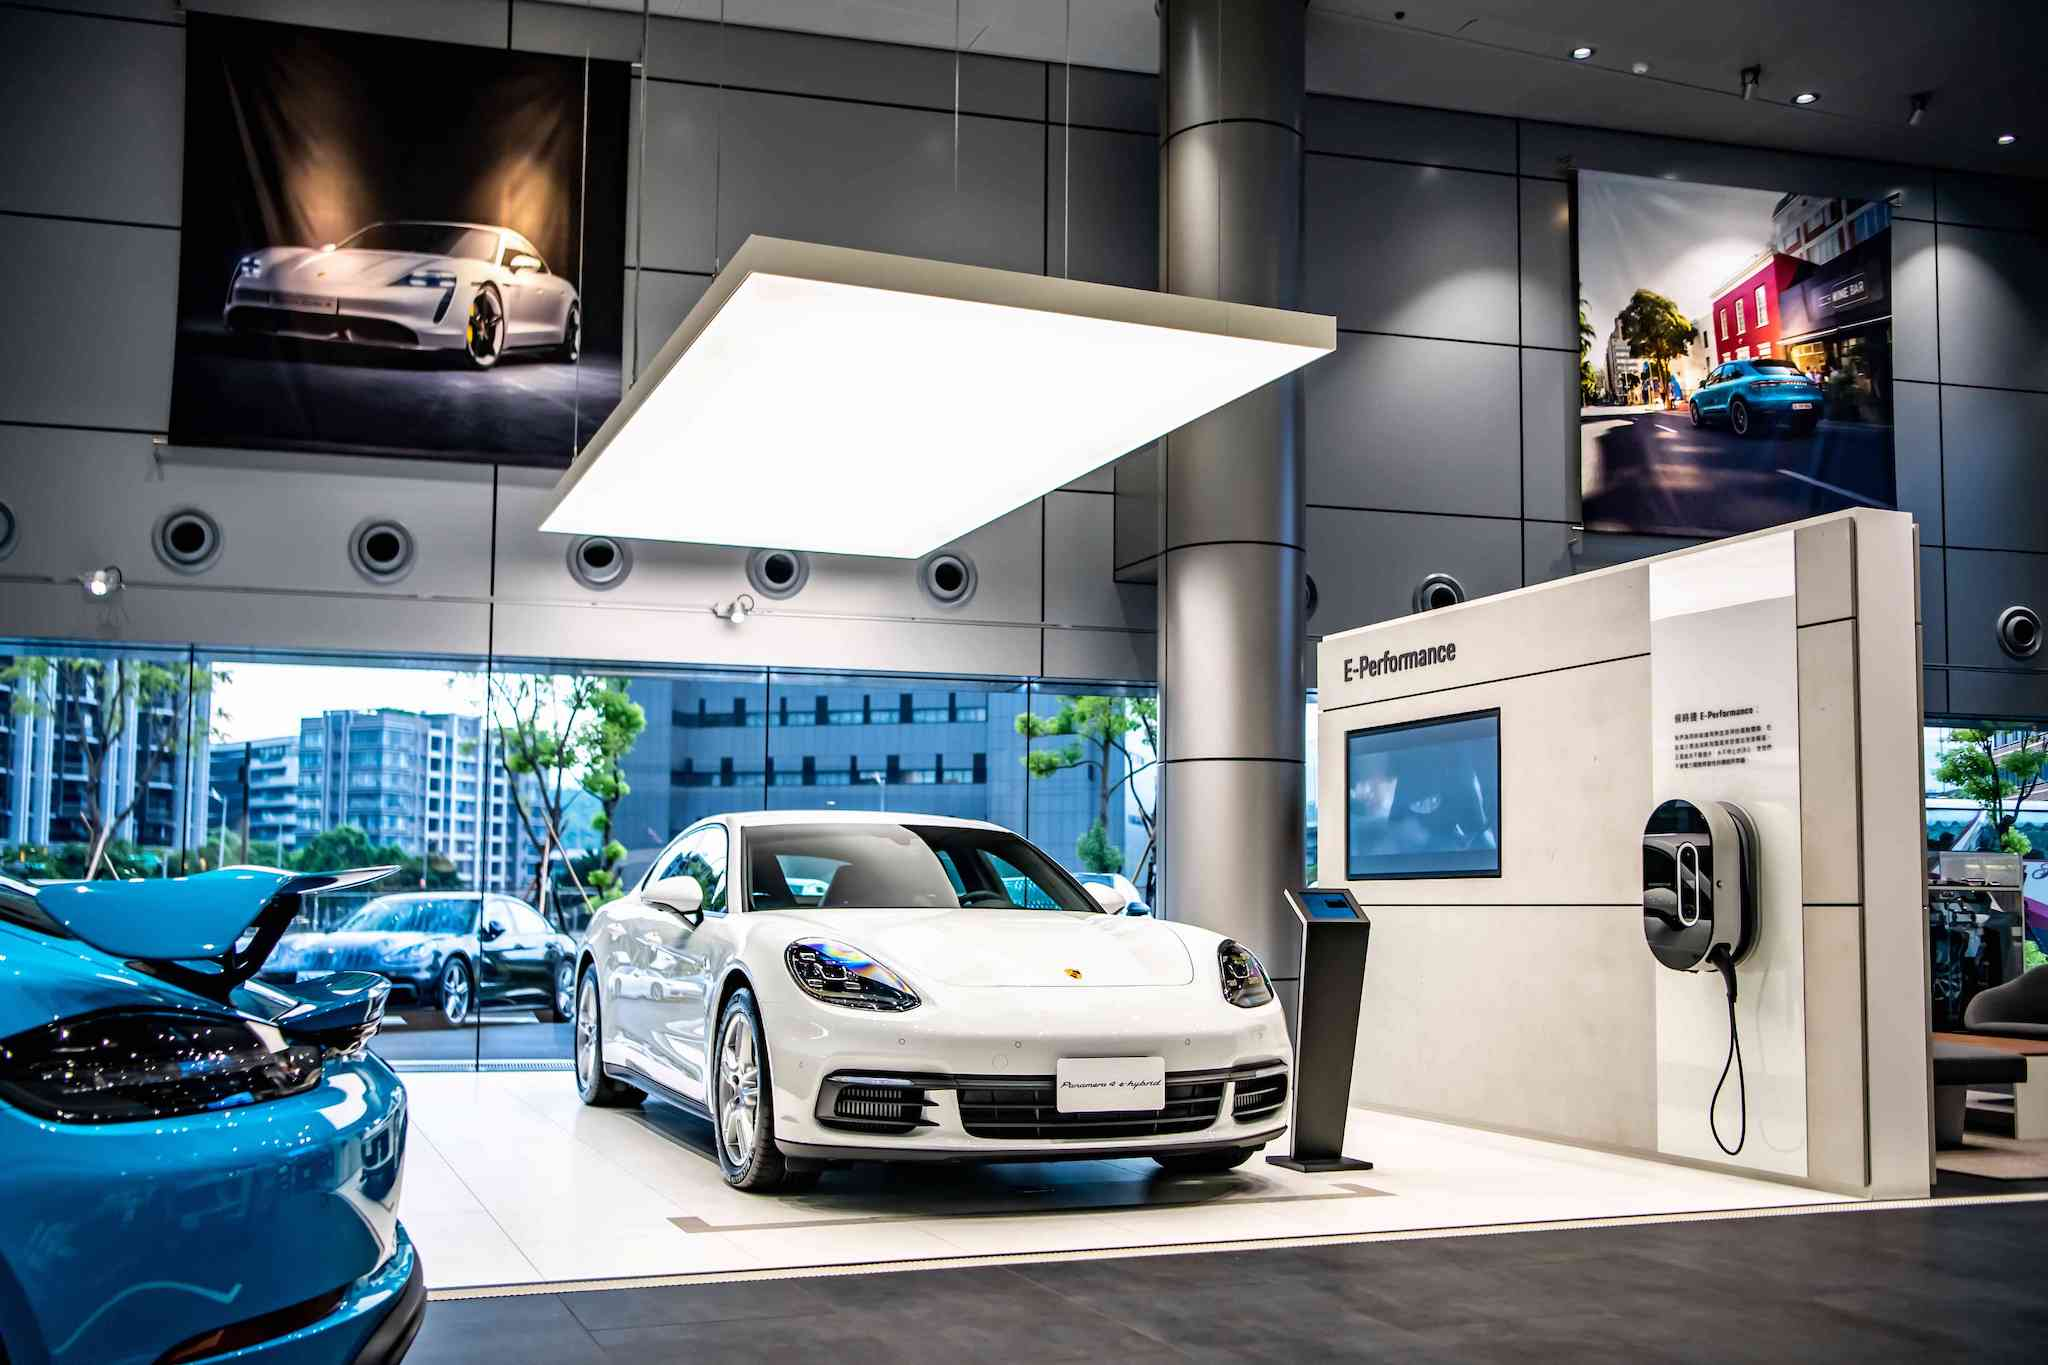 「E-Performance Module」展示新世代純電或混合動力車款,與數位化創新科技服務。